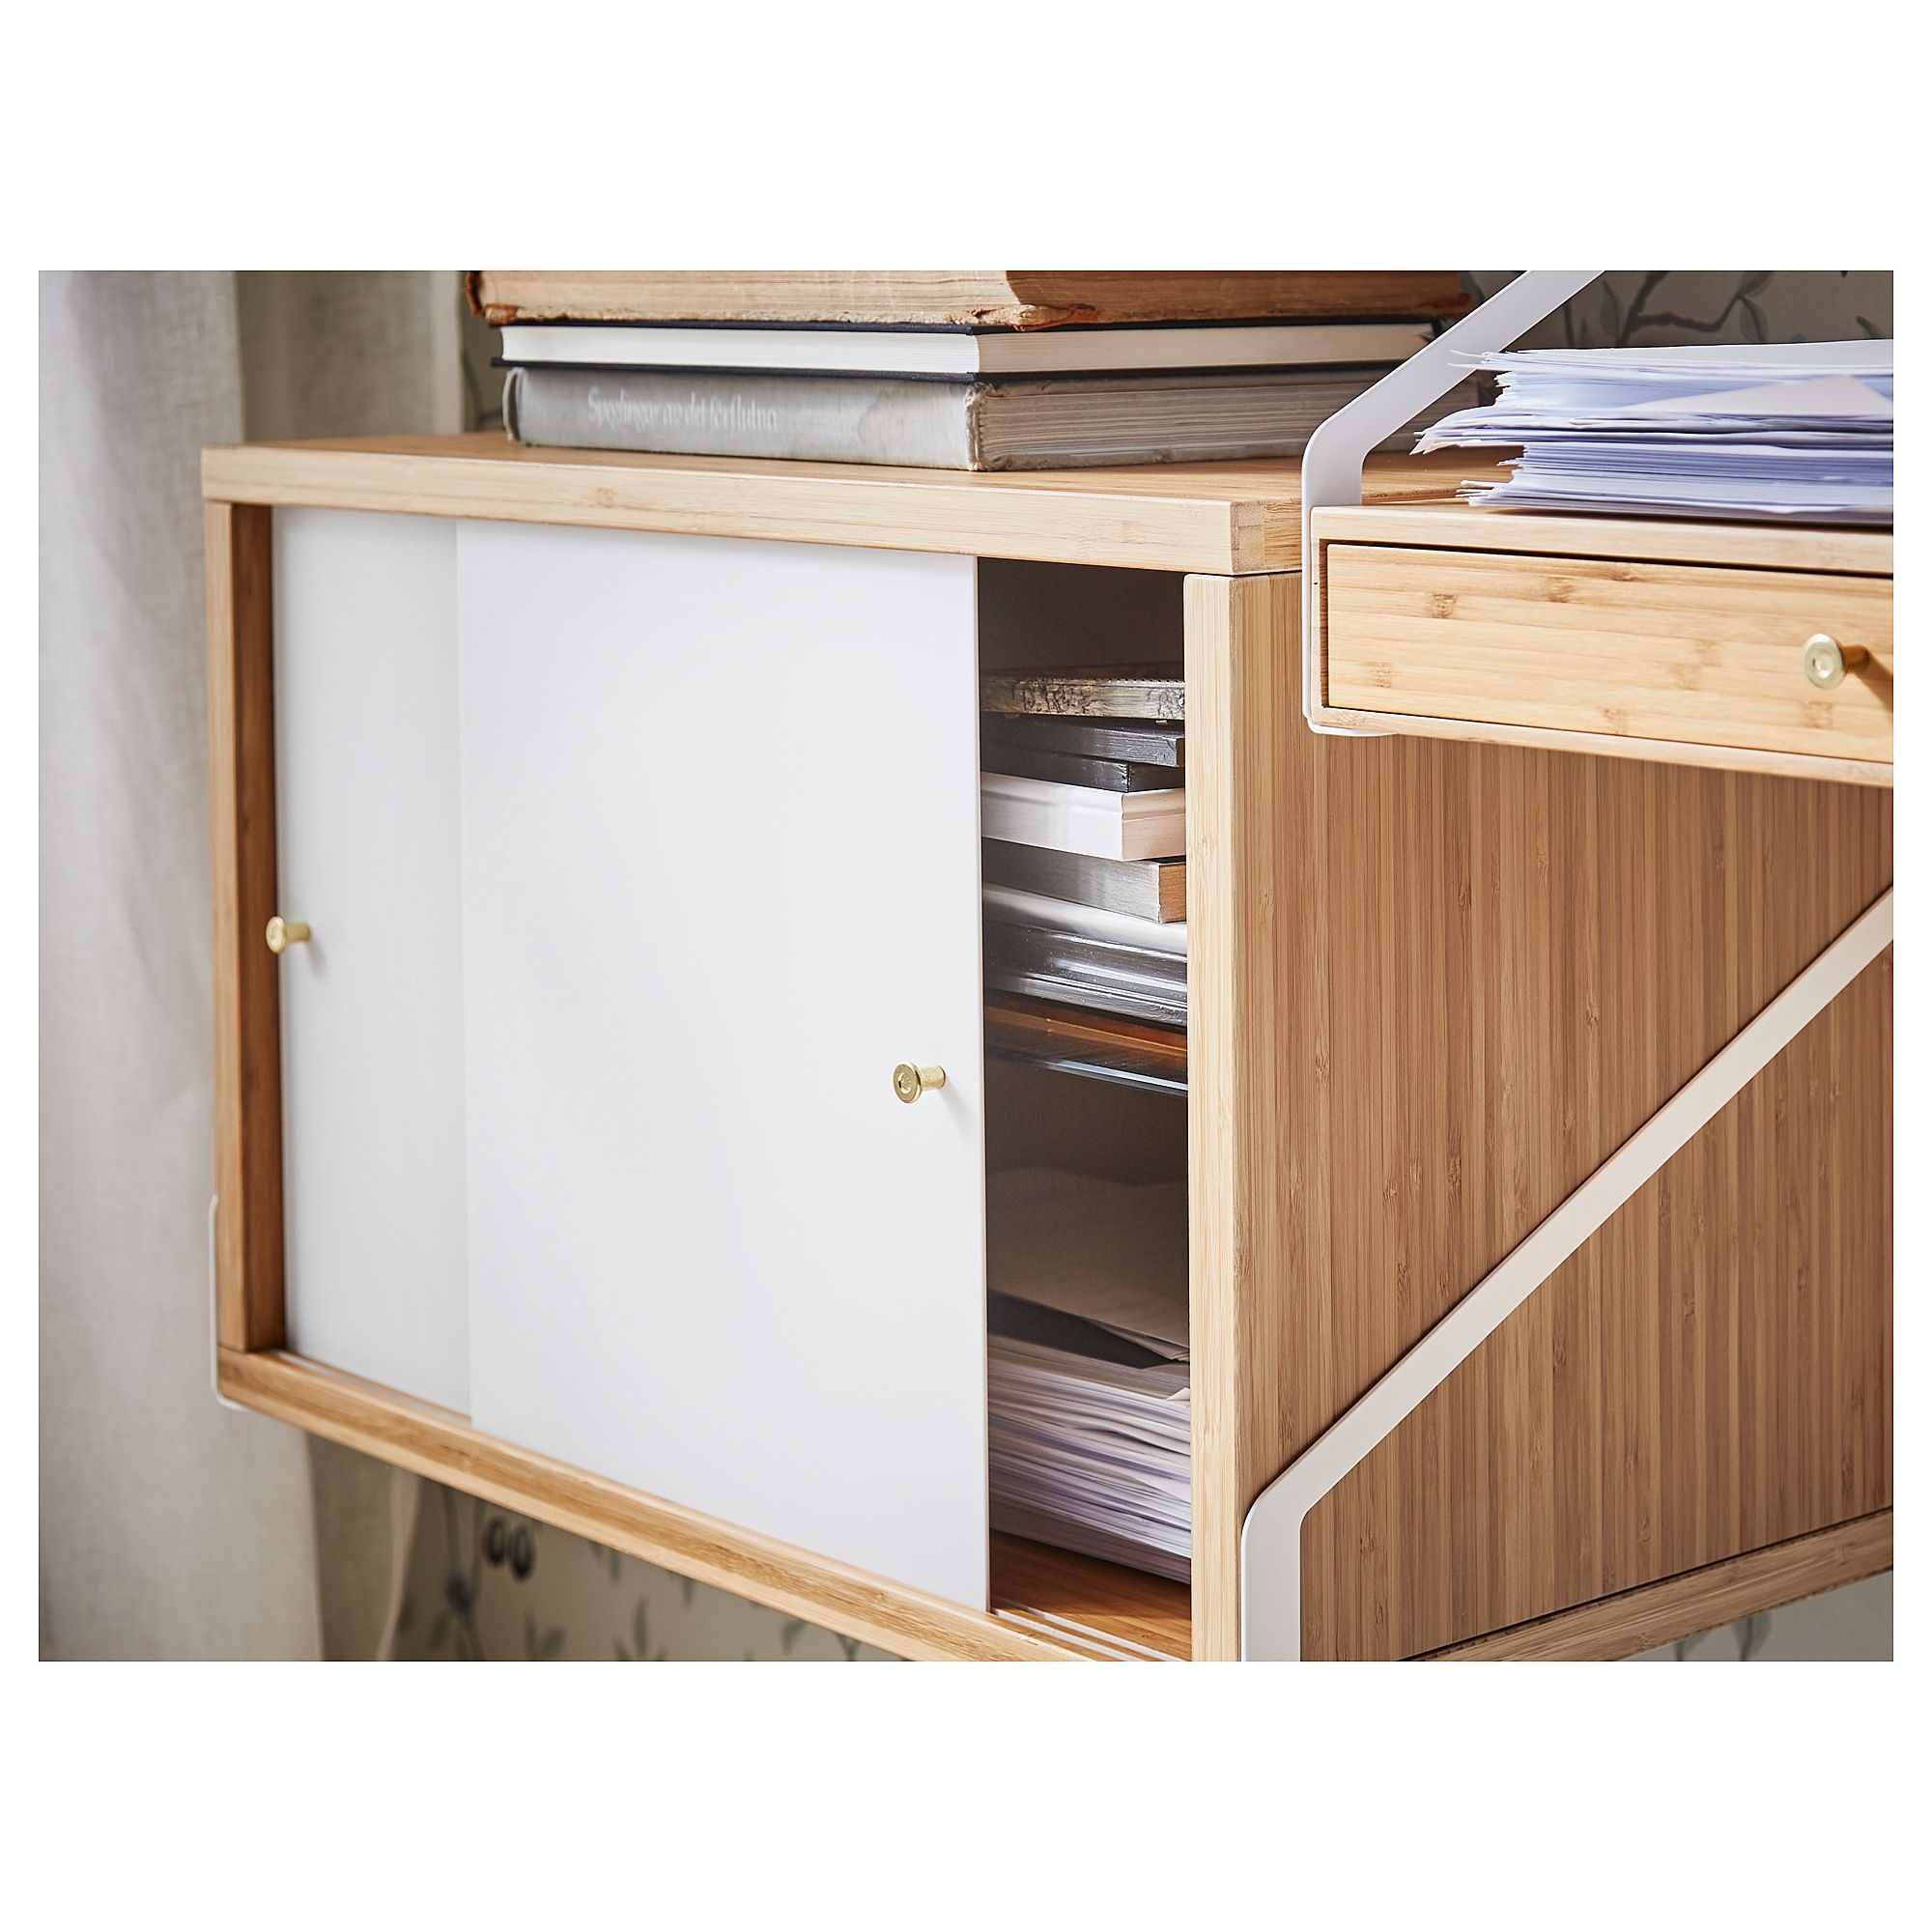 Us Furniture And Home Furnishings Ikea Ikea Svalnas Bamboo